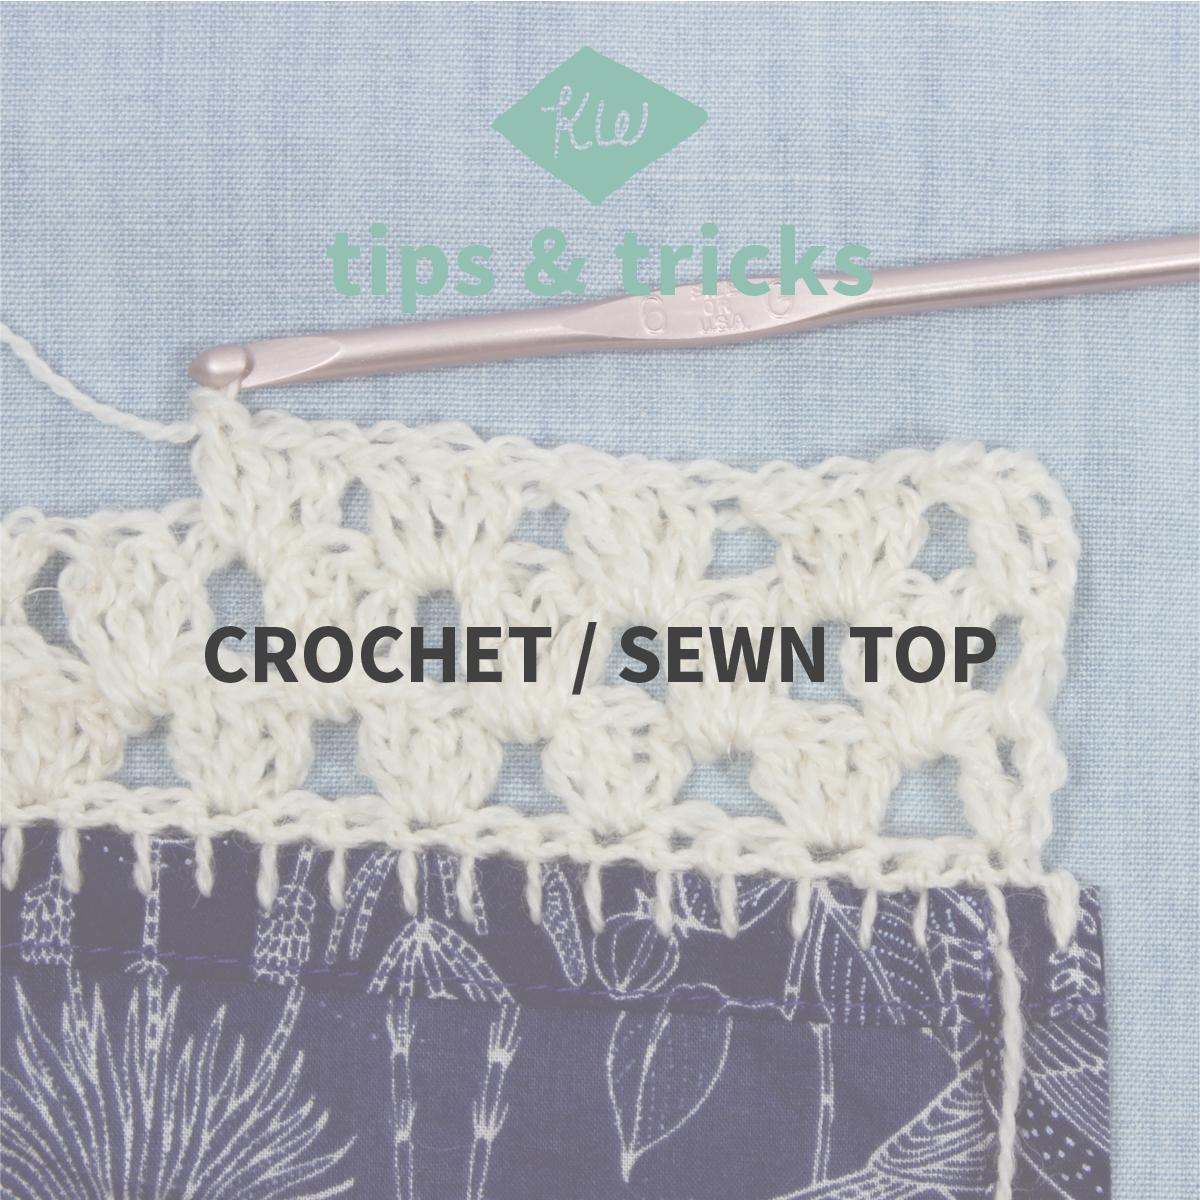 KW Tips + Tricks: Crochet / sewn top